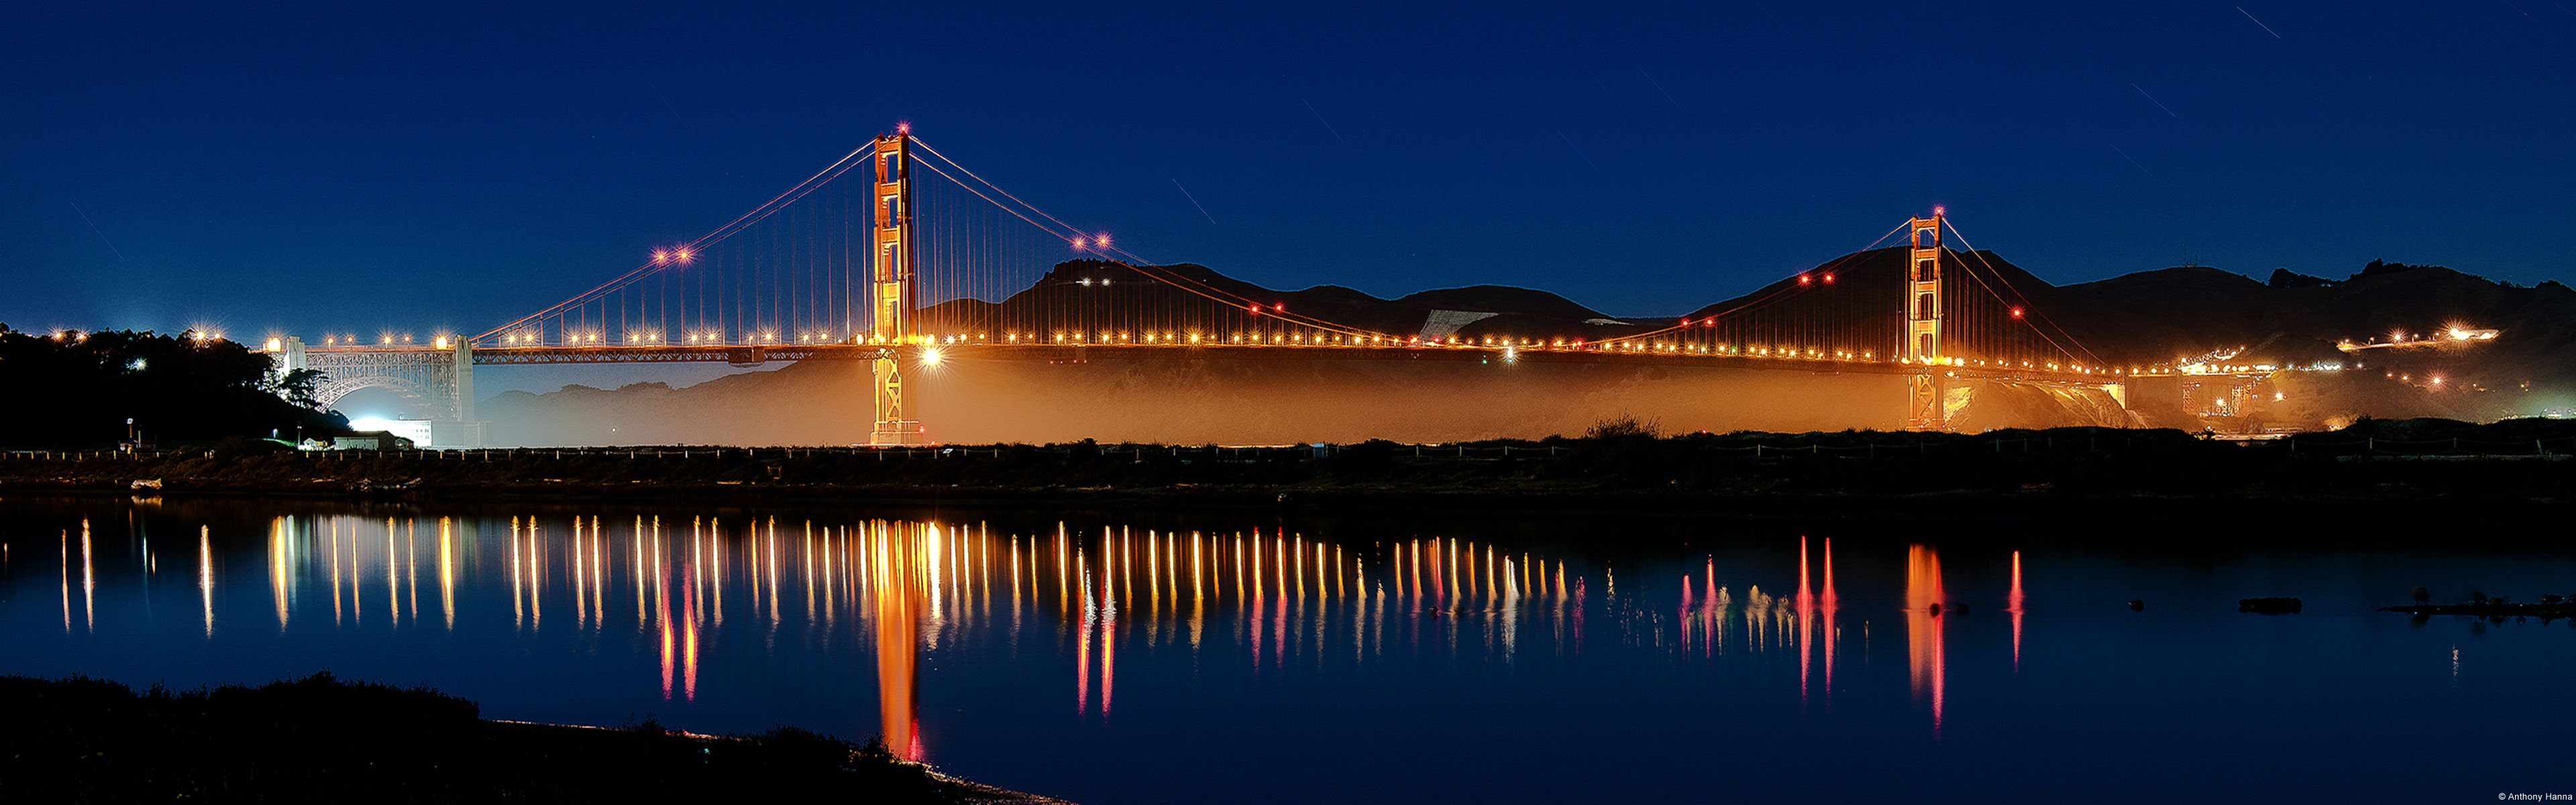 Amazing Wallpaper Night Golden Gate Bridge - 459694  HD-26881.jpg